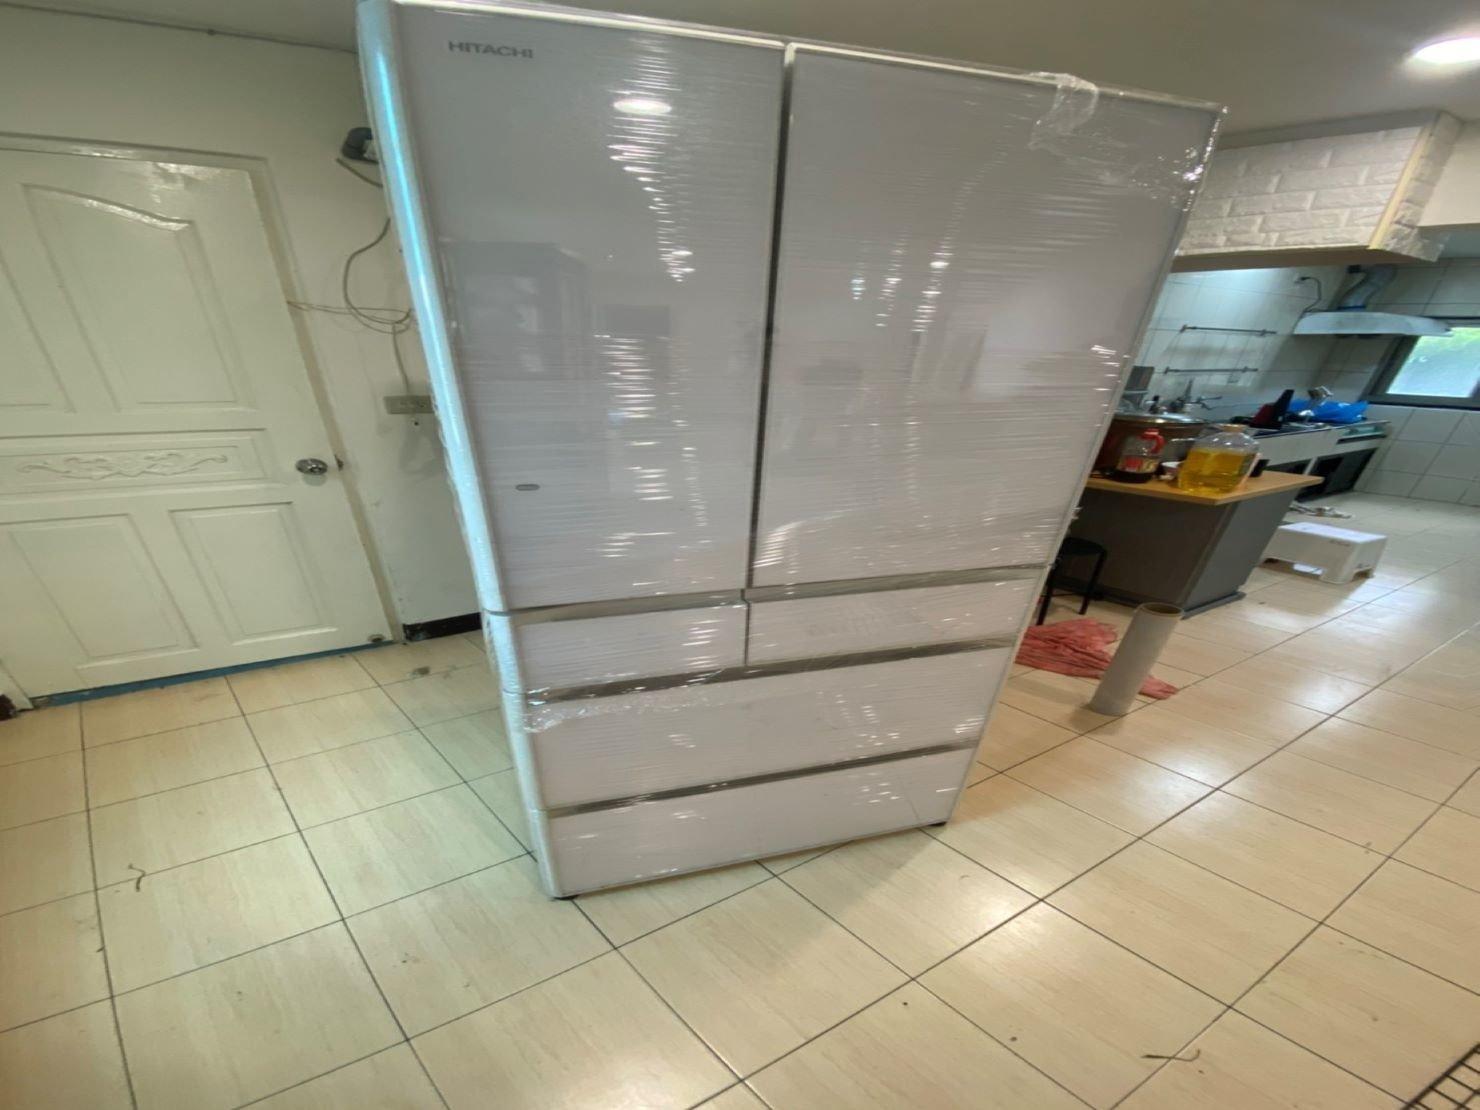 HITACHI大型量150公斤比人還要高的冰箱搬運-交給台北搬家推薦【榮福搬家】南港搬家公司是最佳的選擇